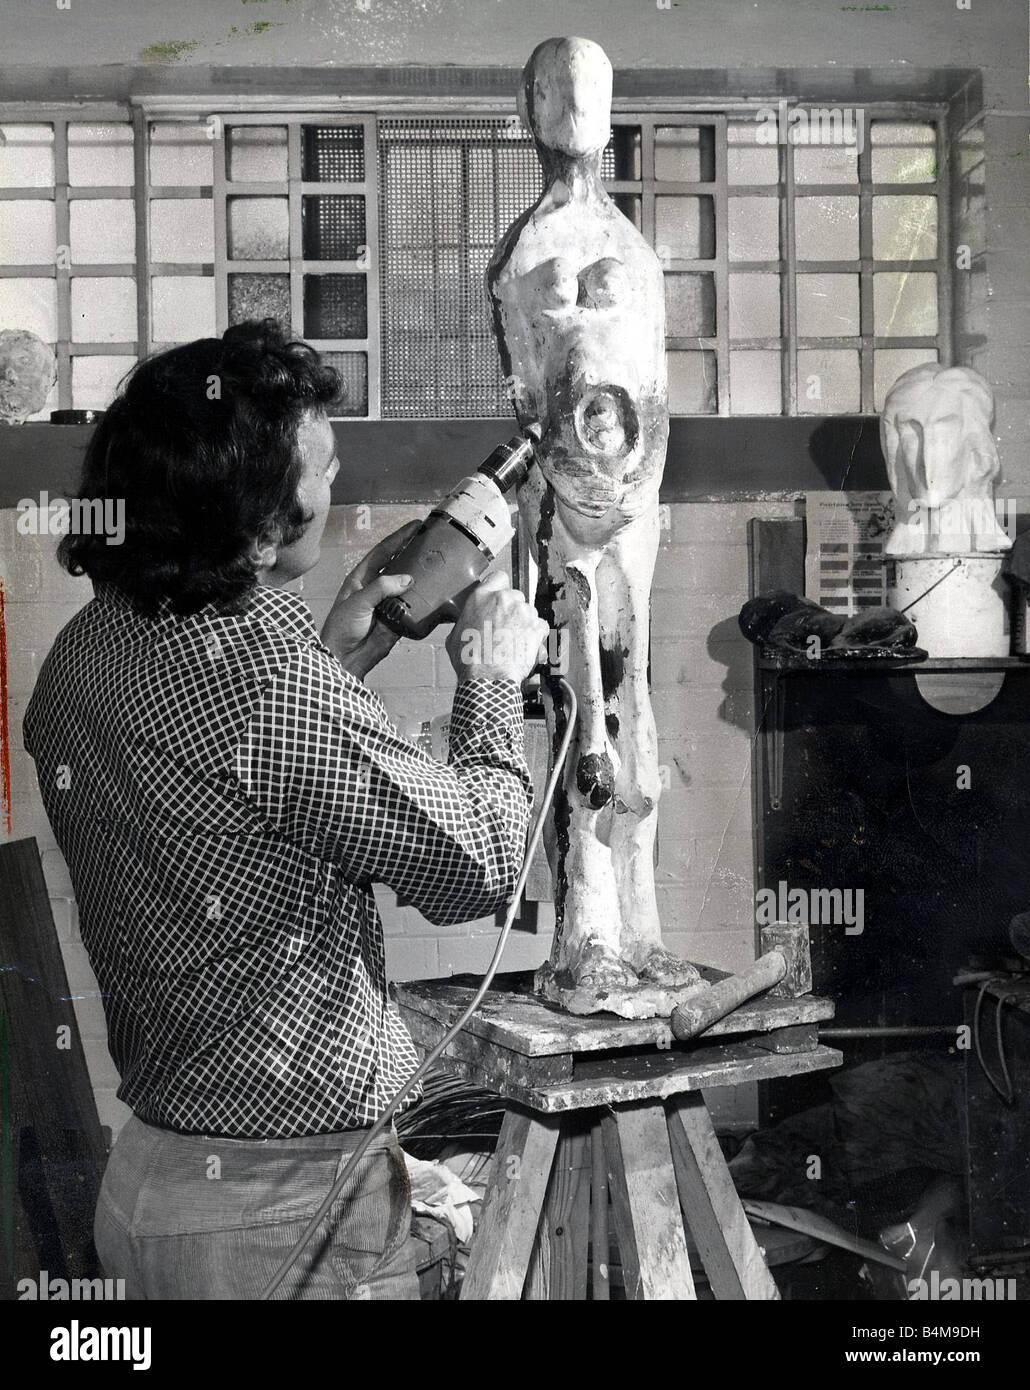 Jimmy Boyle working on sculpture Circa 1990 Stock Photo - Alamy